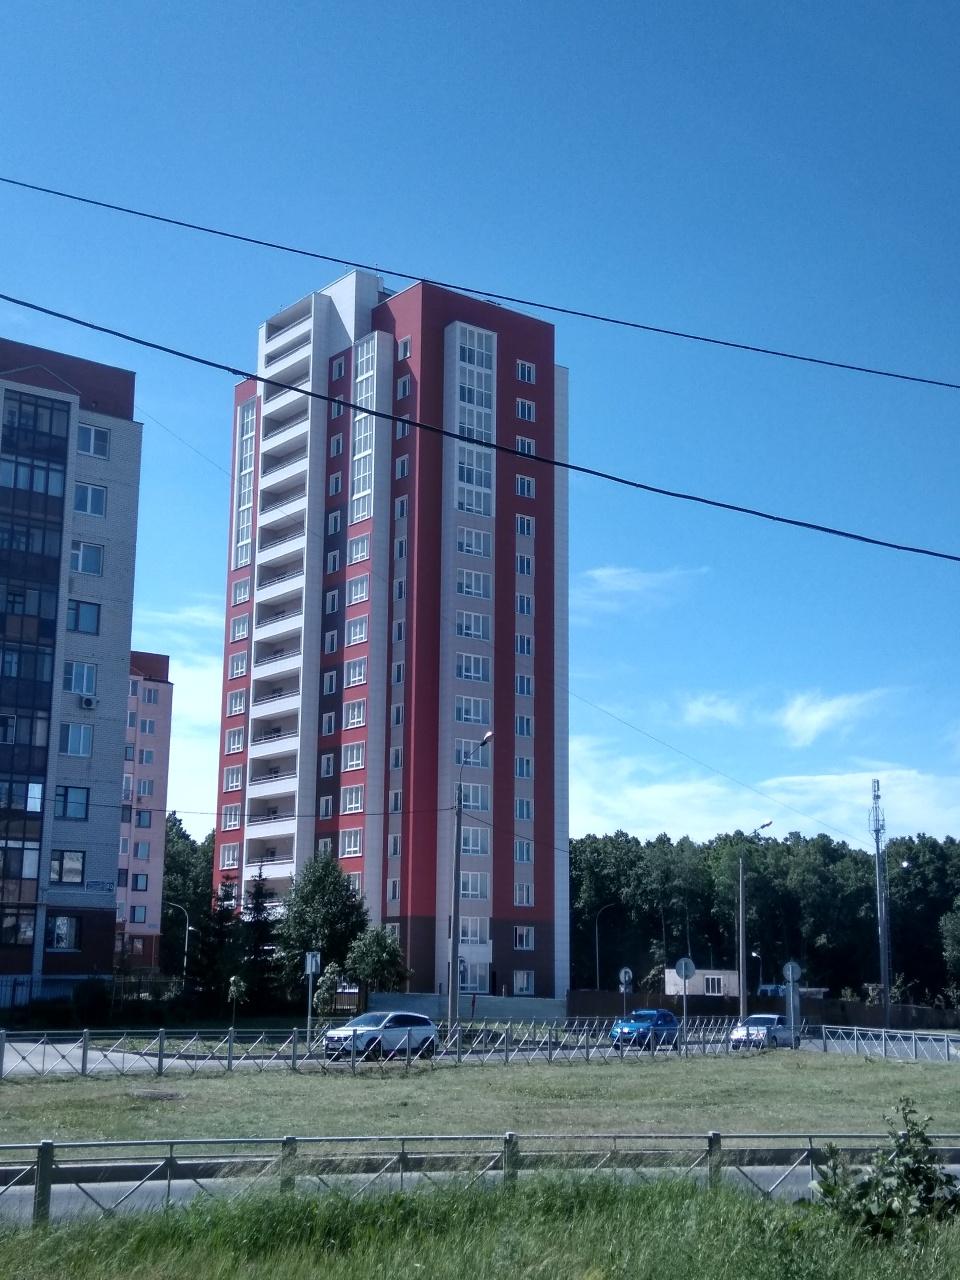 Продам двухкомнатную (2-комн.) квартиру, Дубравная ул, 38кА стр., Казань г